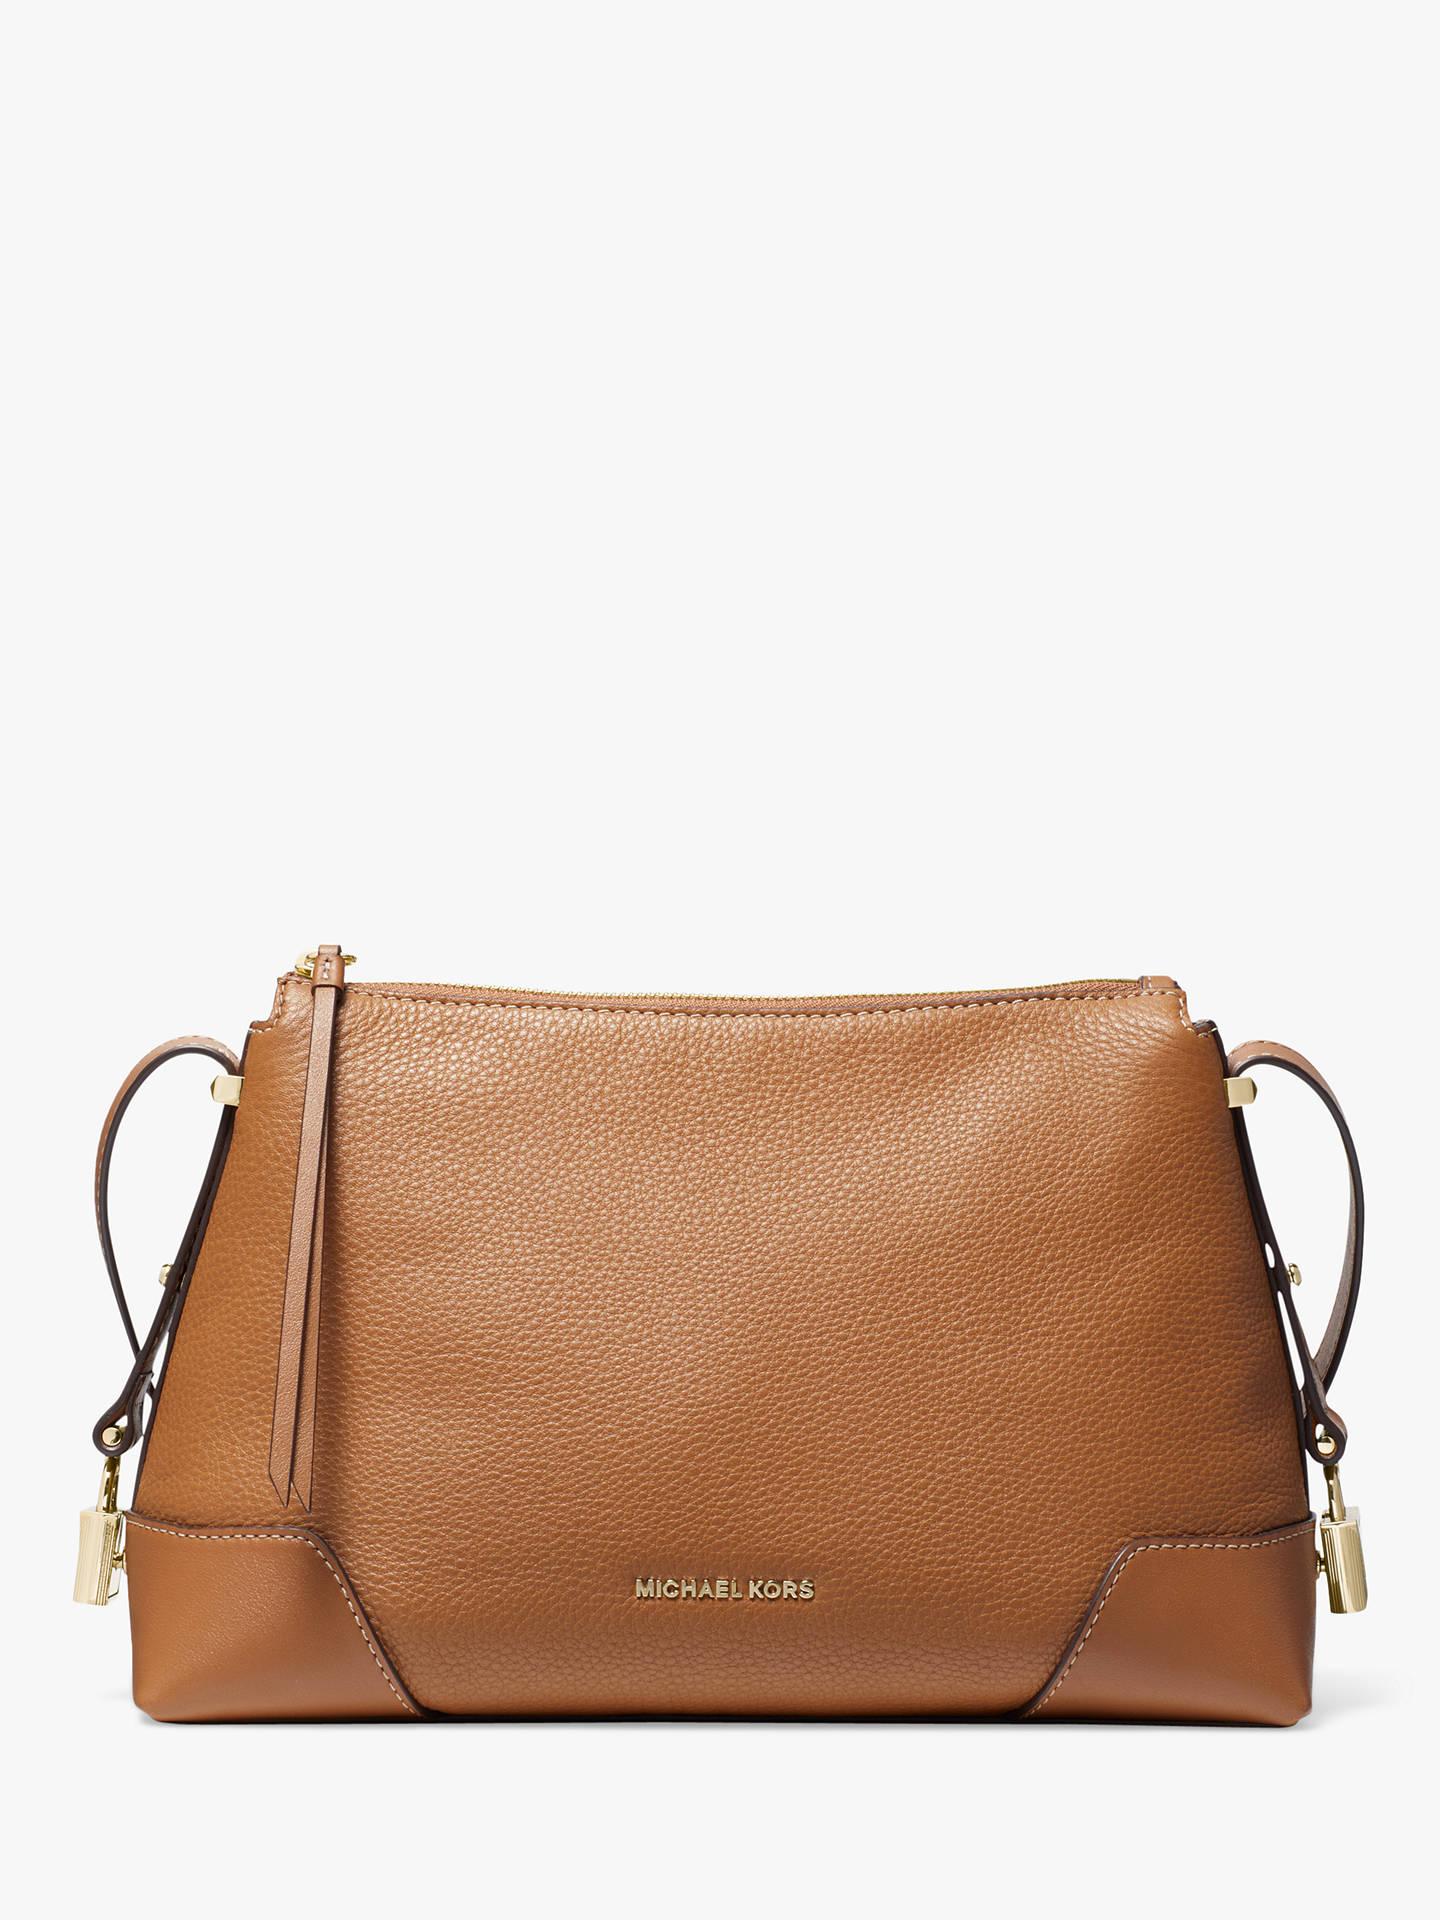 7645b63ebf8a MICHAEL Michael Kors Crosby Medium Leather Messenger Bag at John ...